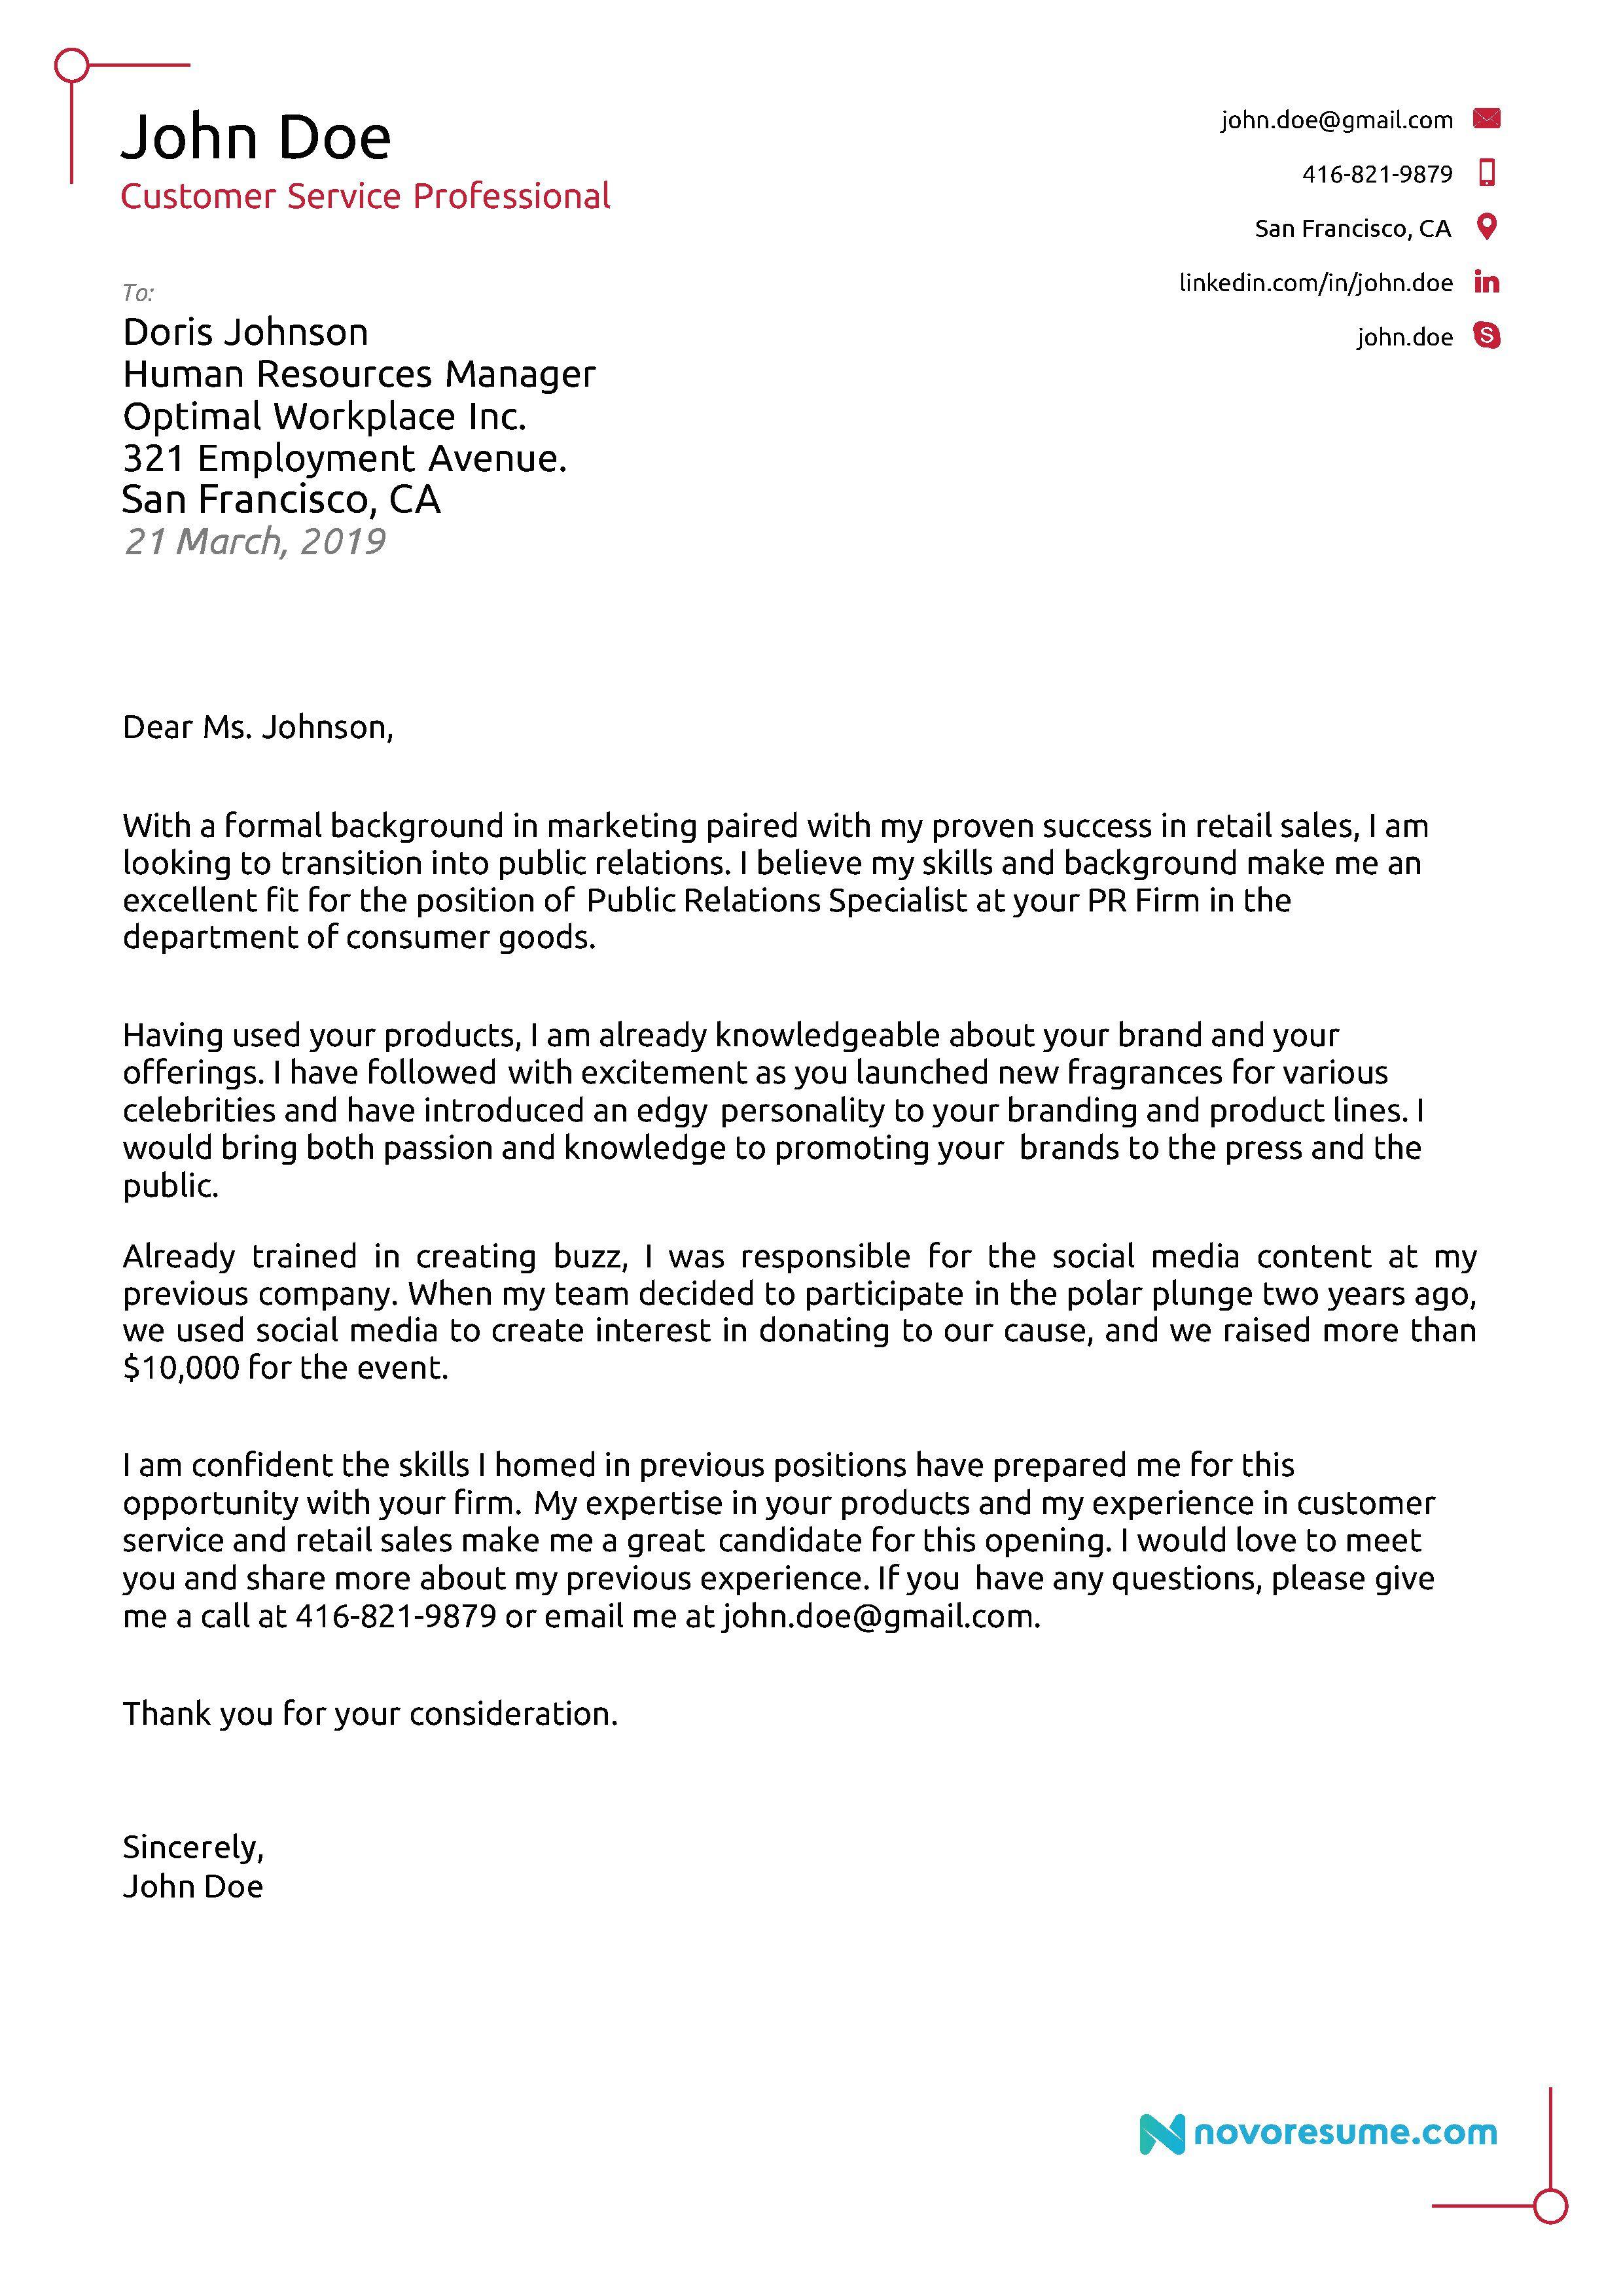 004 Fascinating Cover Letter For Job Template Image  Sample Cv Application Email Resume Microsoft WordFull